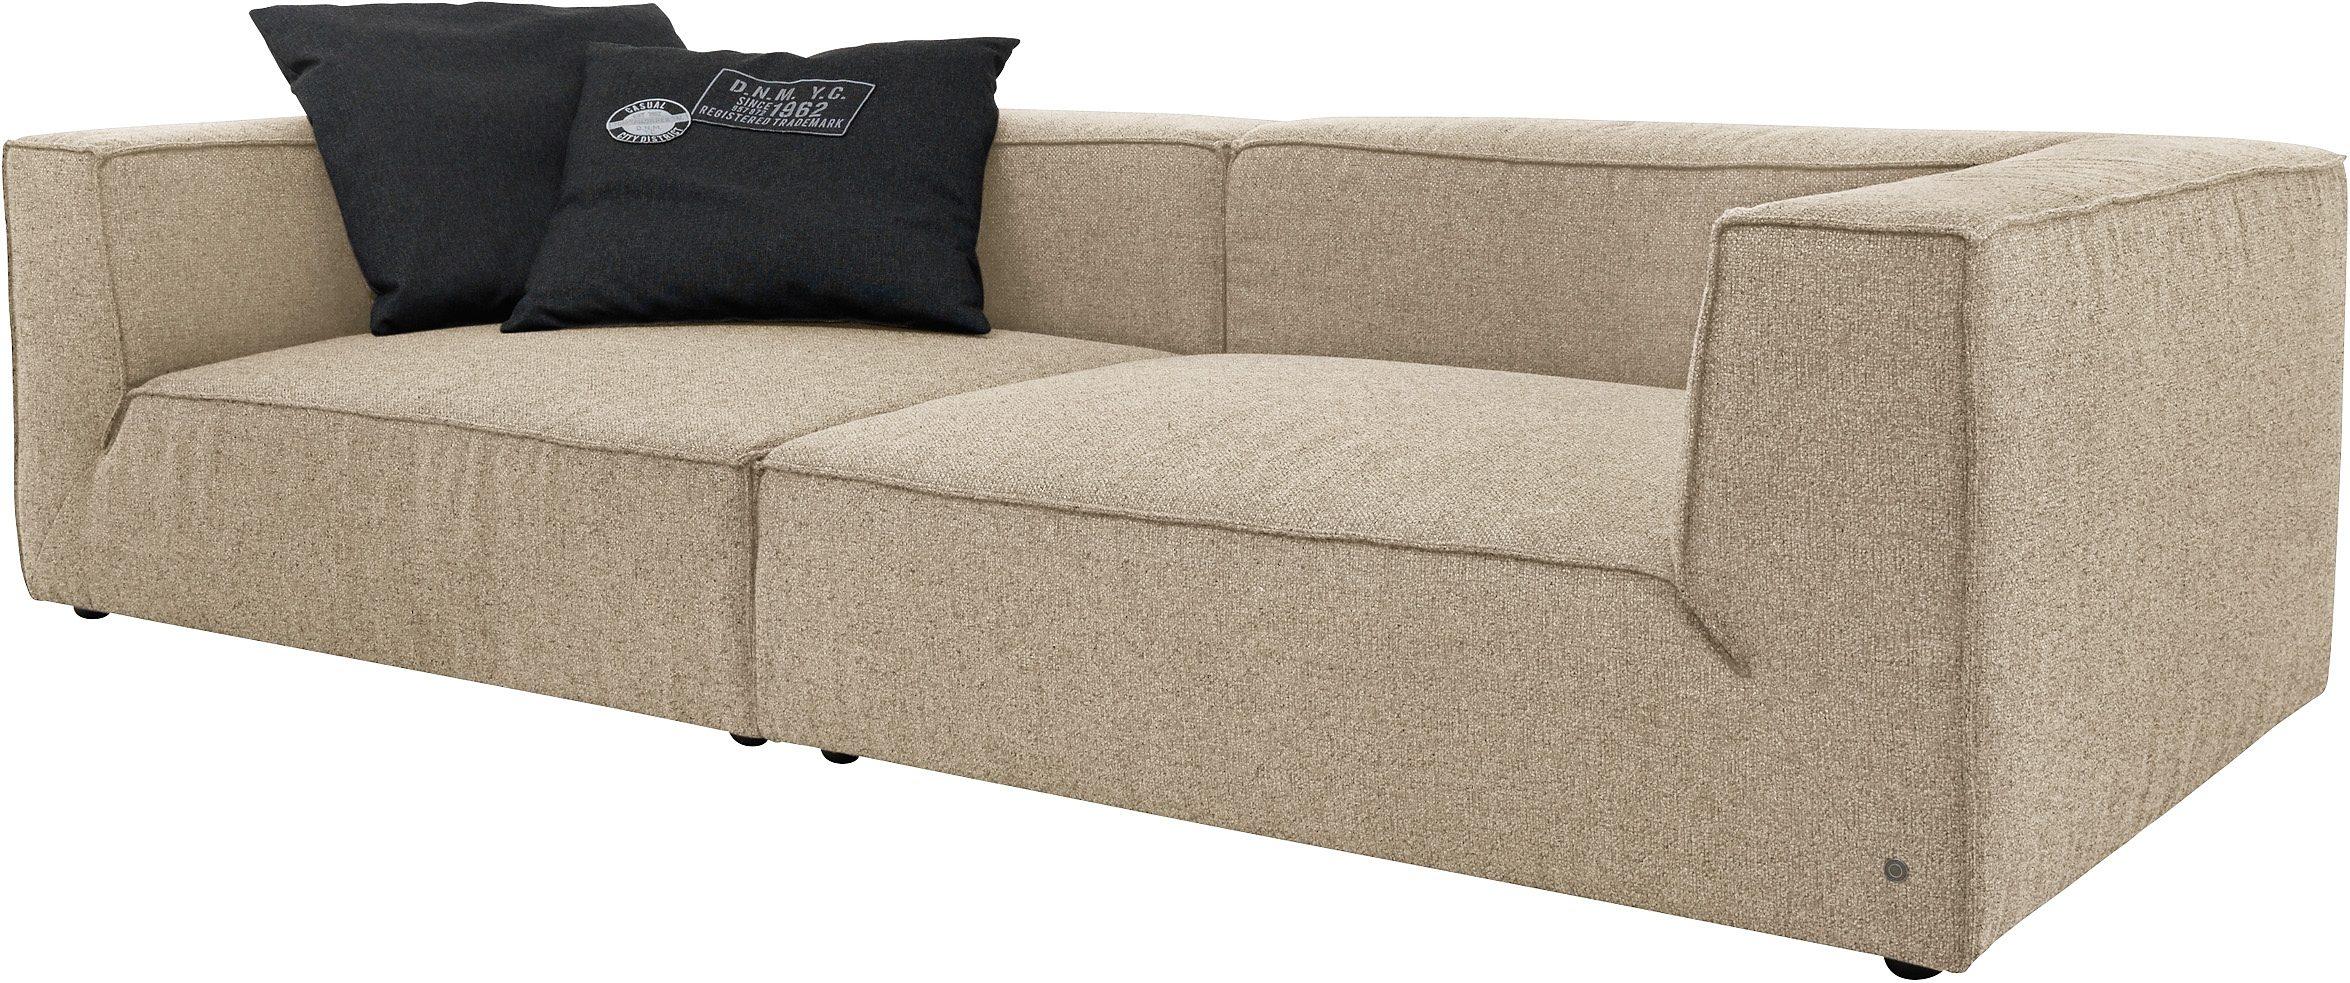 TOM TAILOR Big-Sofa BIG CUBE